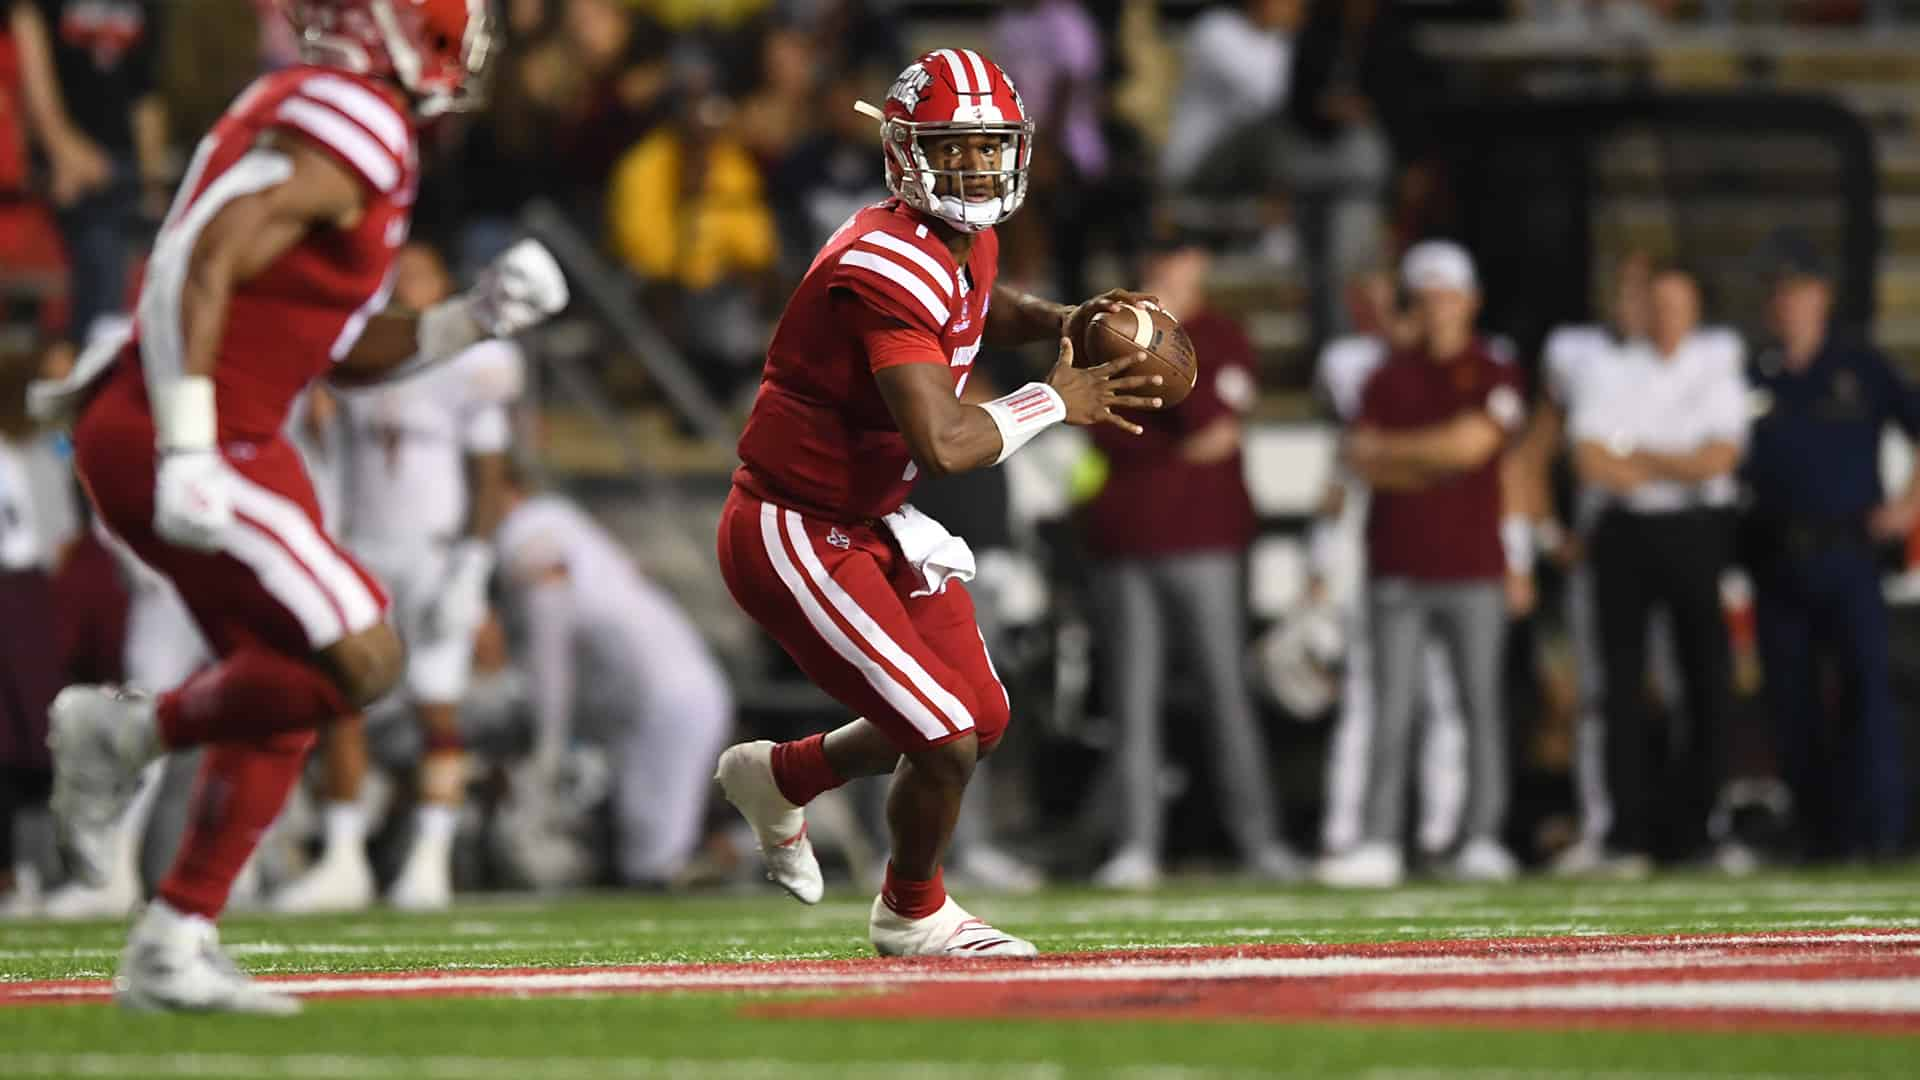 Louisiana Lafayette quarterback Levi Lewis chasing greatness